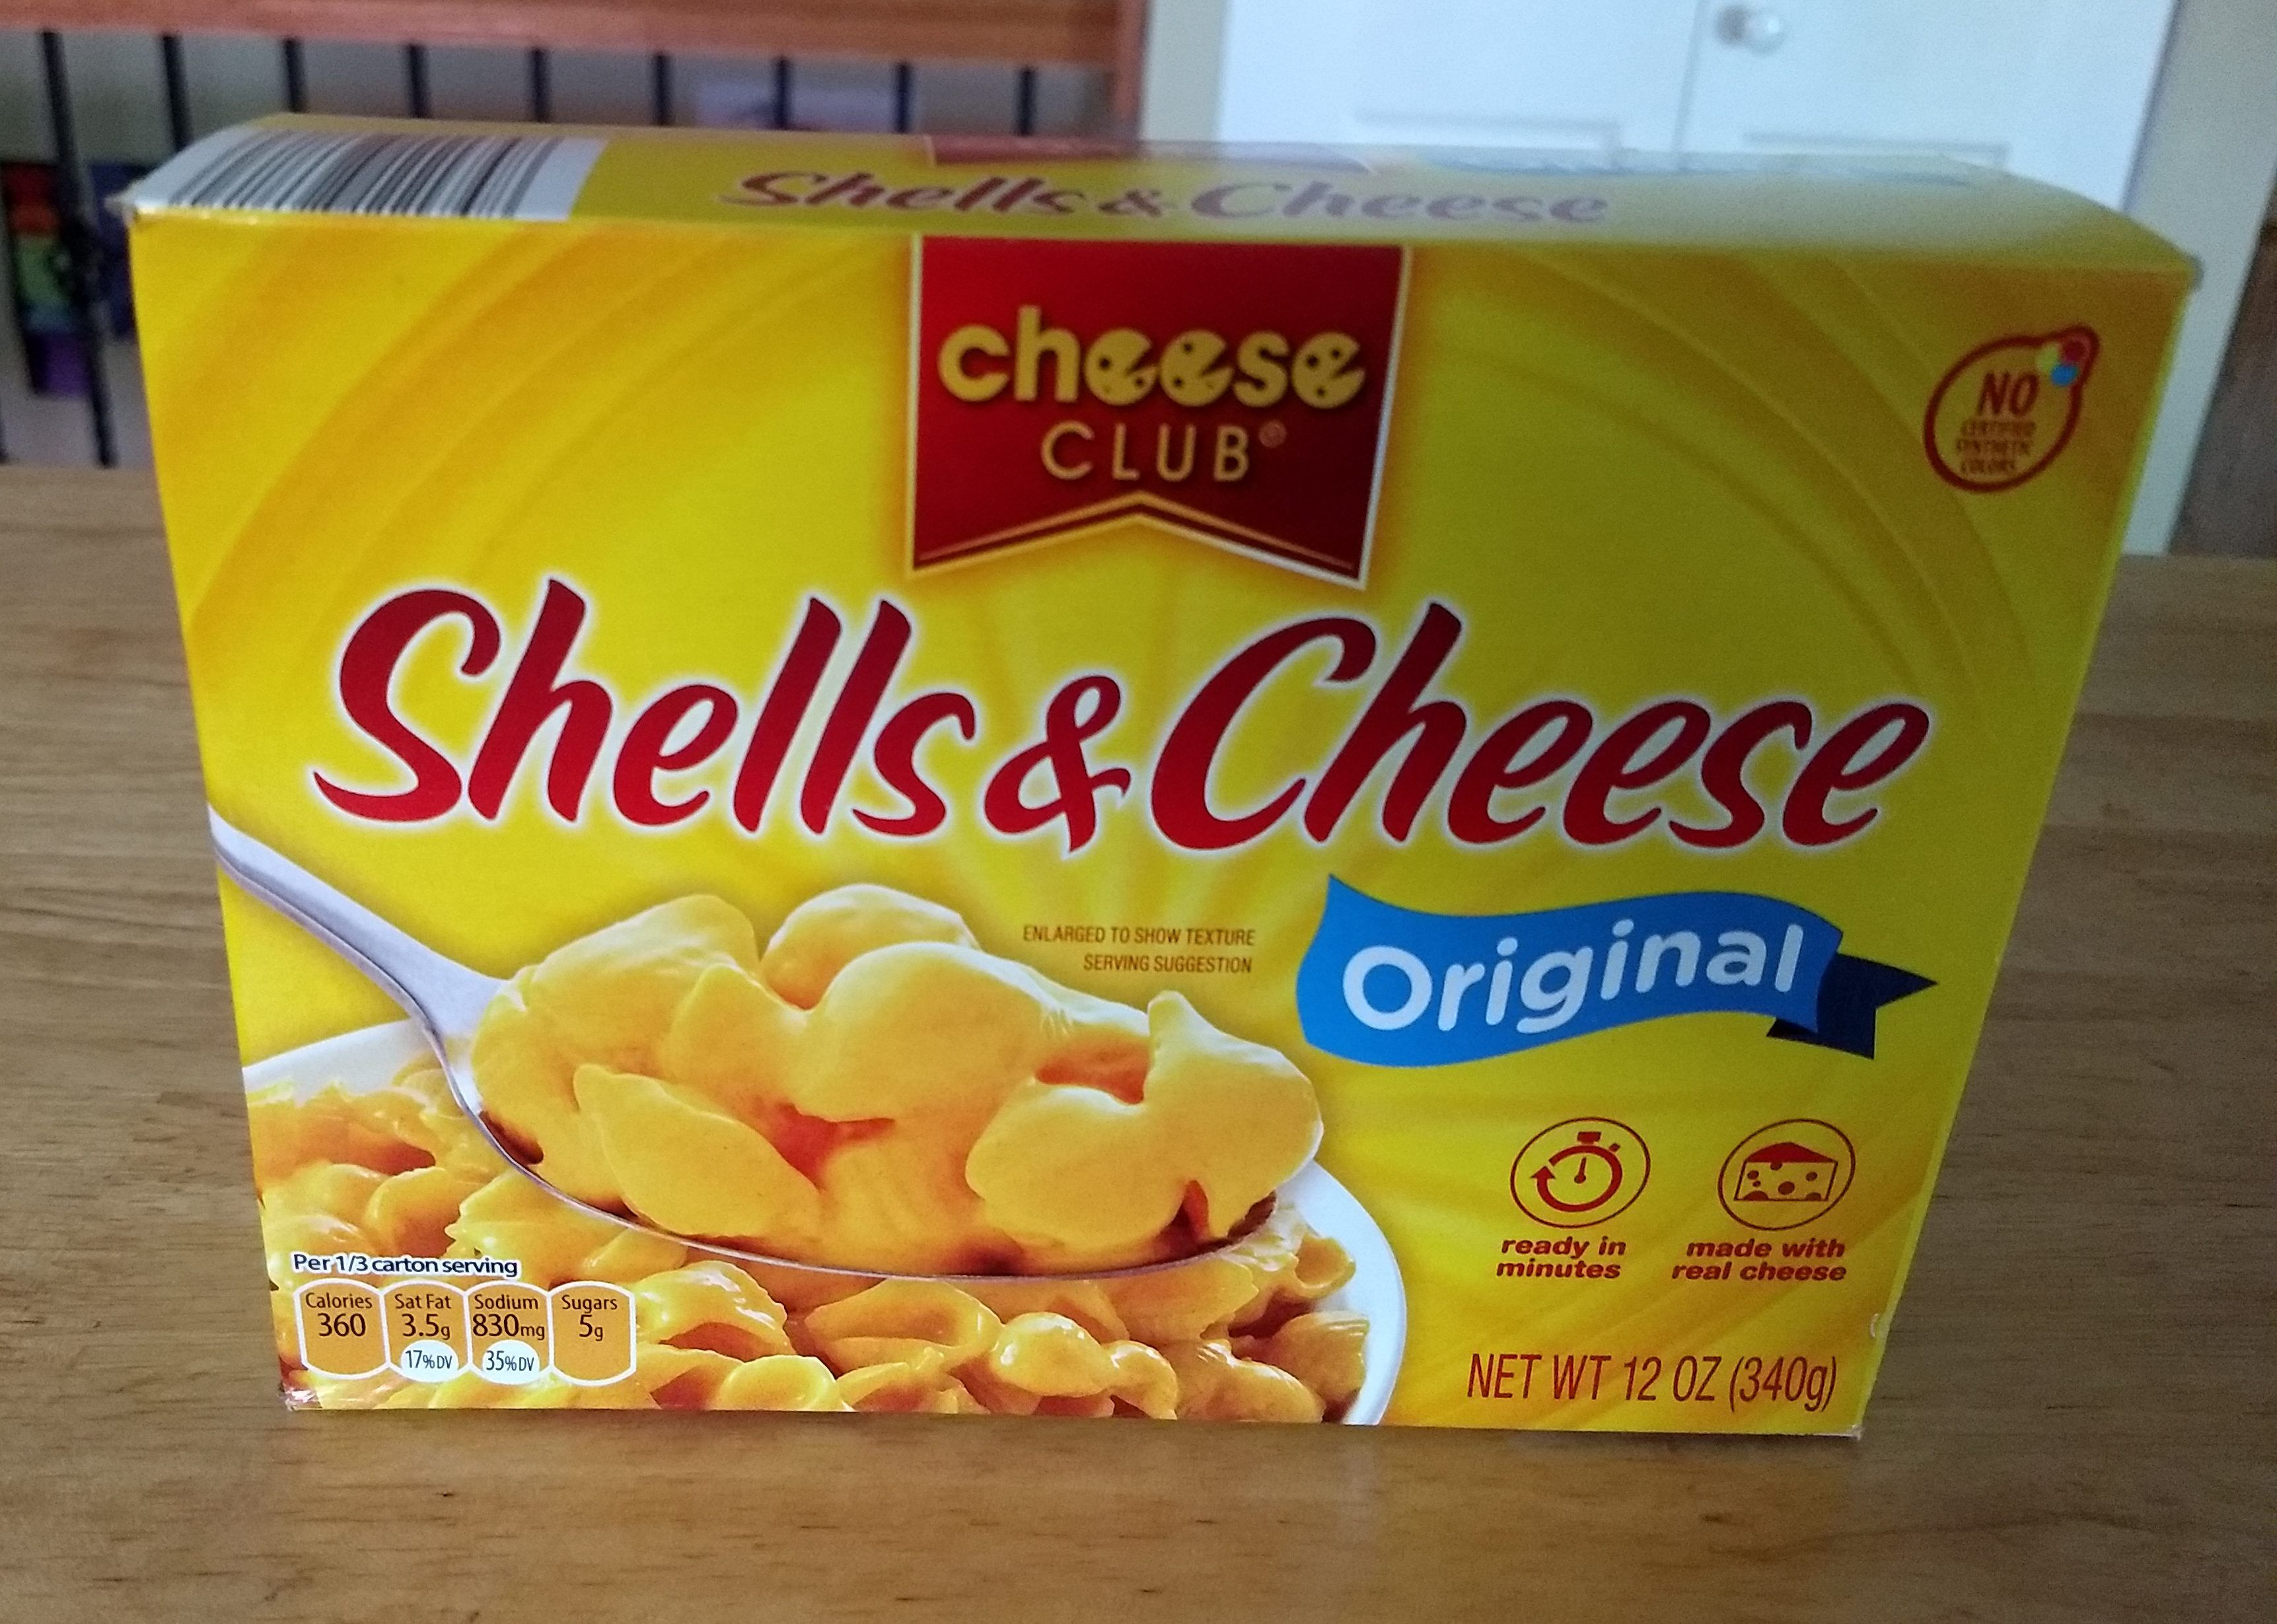 Cheese Club Shells And Cheese Cheese Club Cheese Stuffed Shells